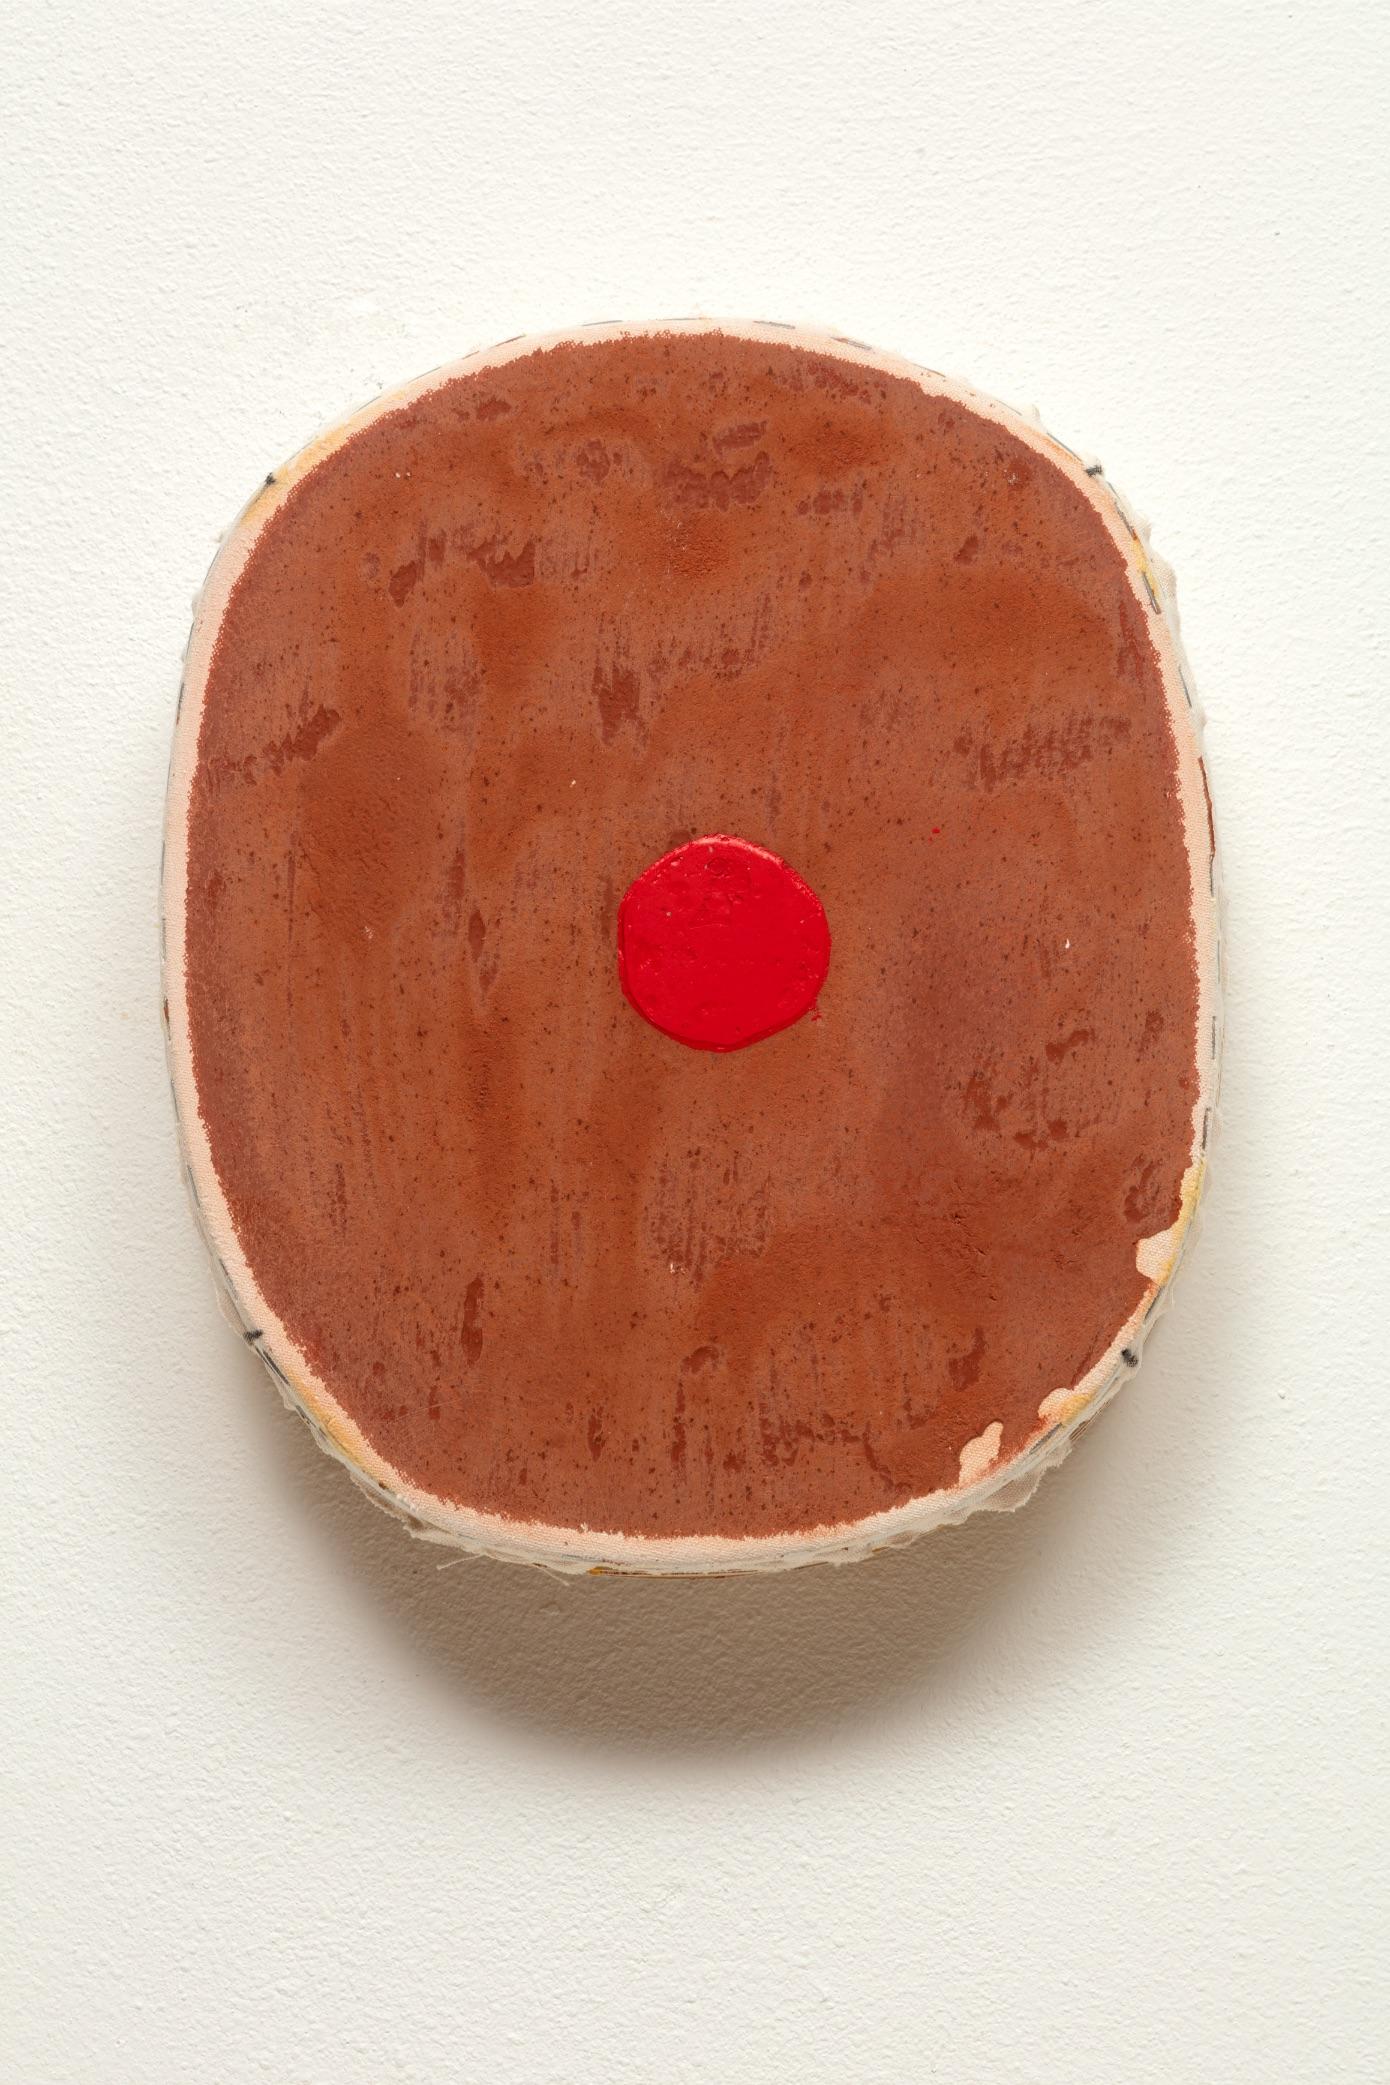 "9: Otis Jones - Brown With Red Circle - Acrylic on Canvas - 14 1⁄4"" x 12 1⁄4"" x 3 1/8"" - 2019"